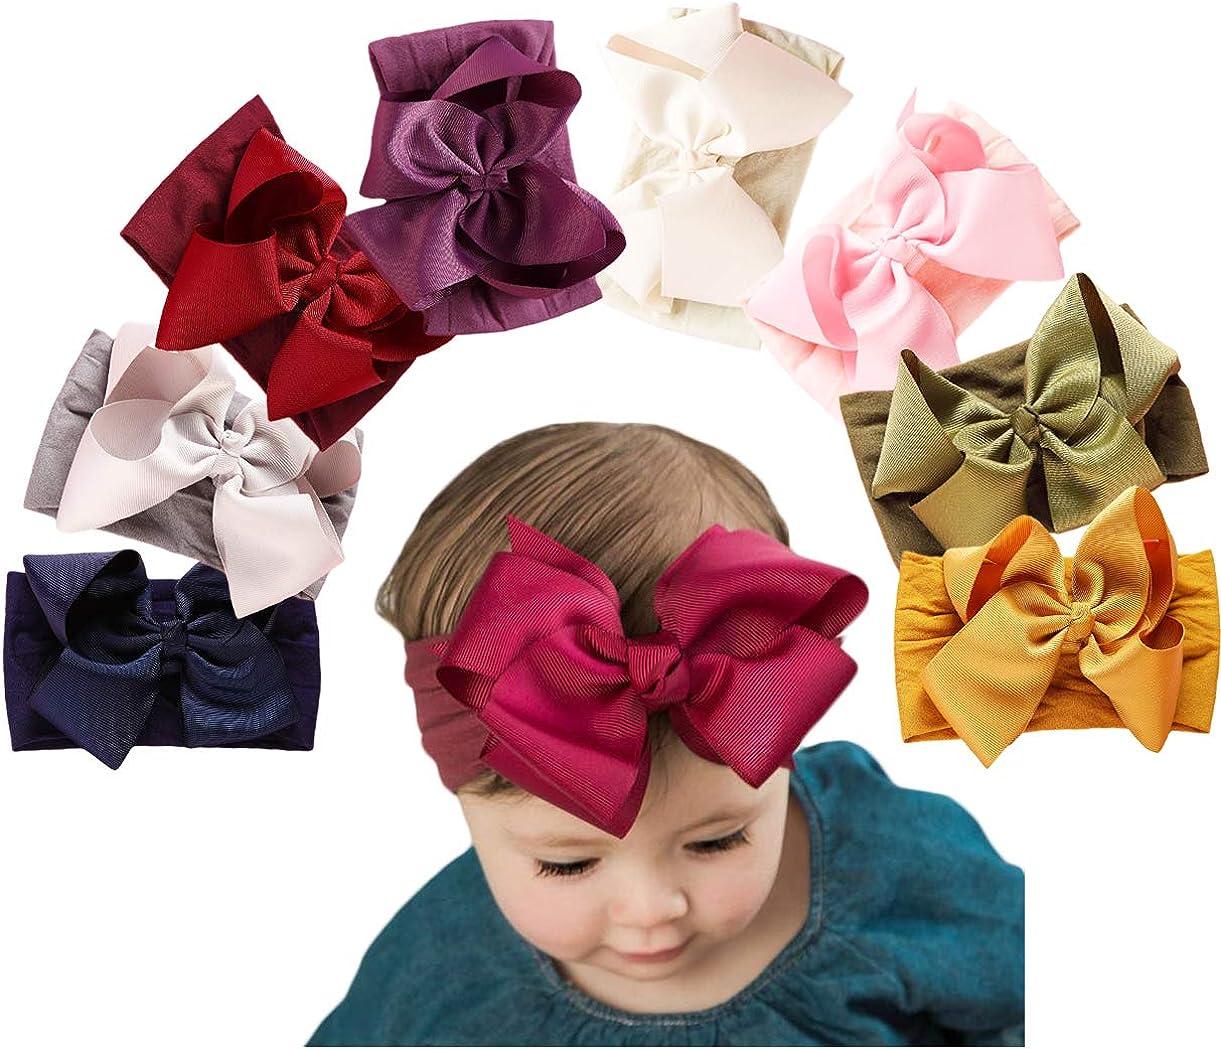 Baby Girl Nylon Headbands,Newborn Infant Toddler Headbands for Girls,Baby Bows and Headbands Child Hair Accessories